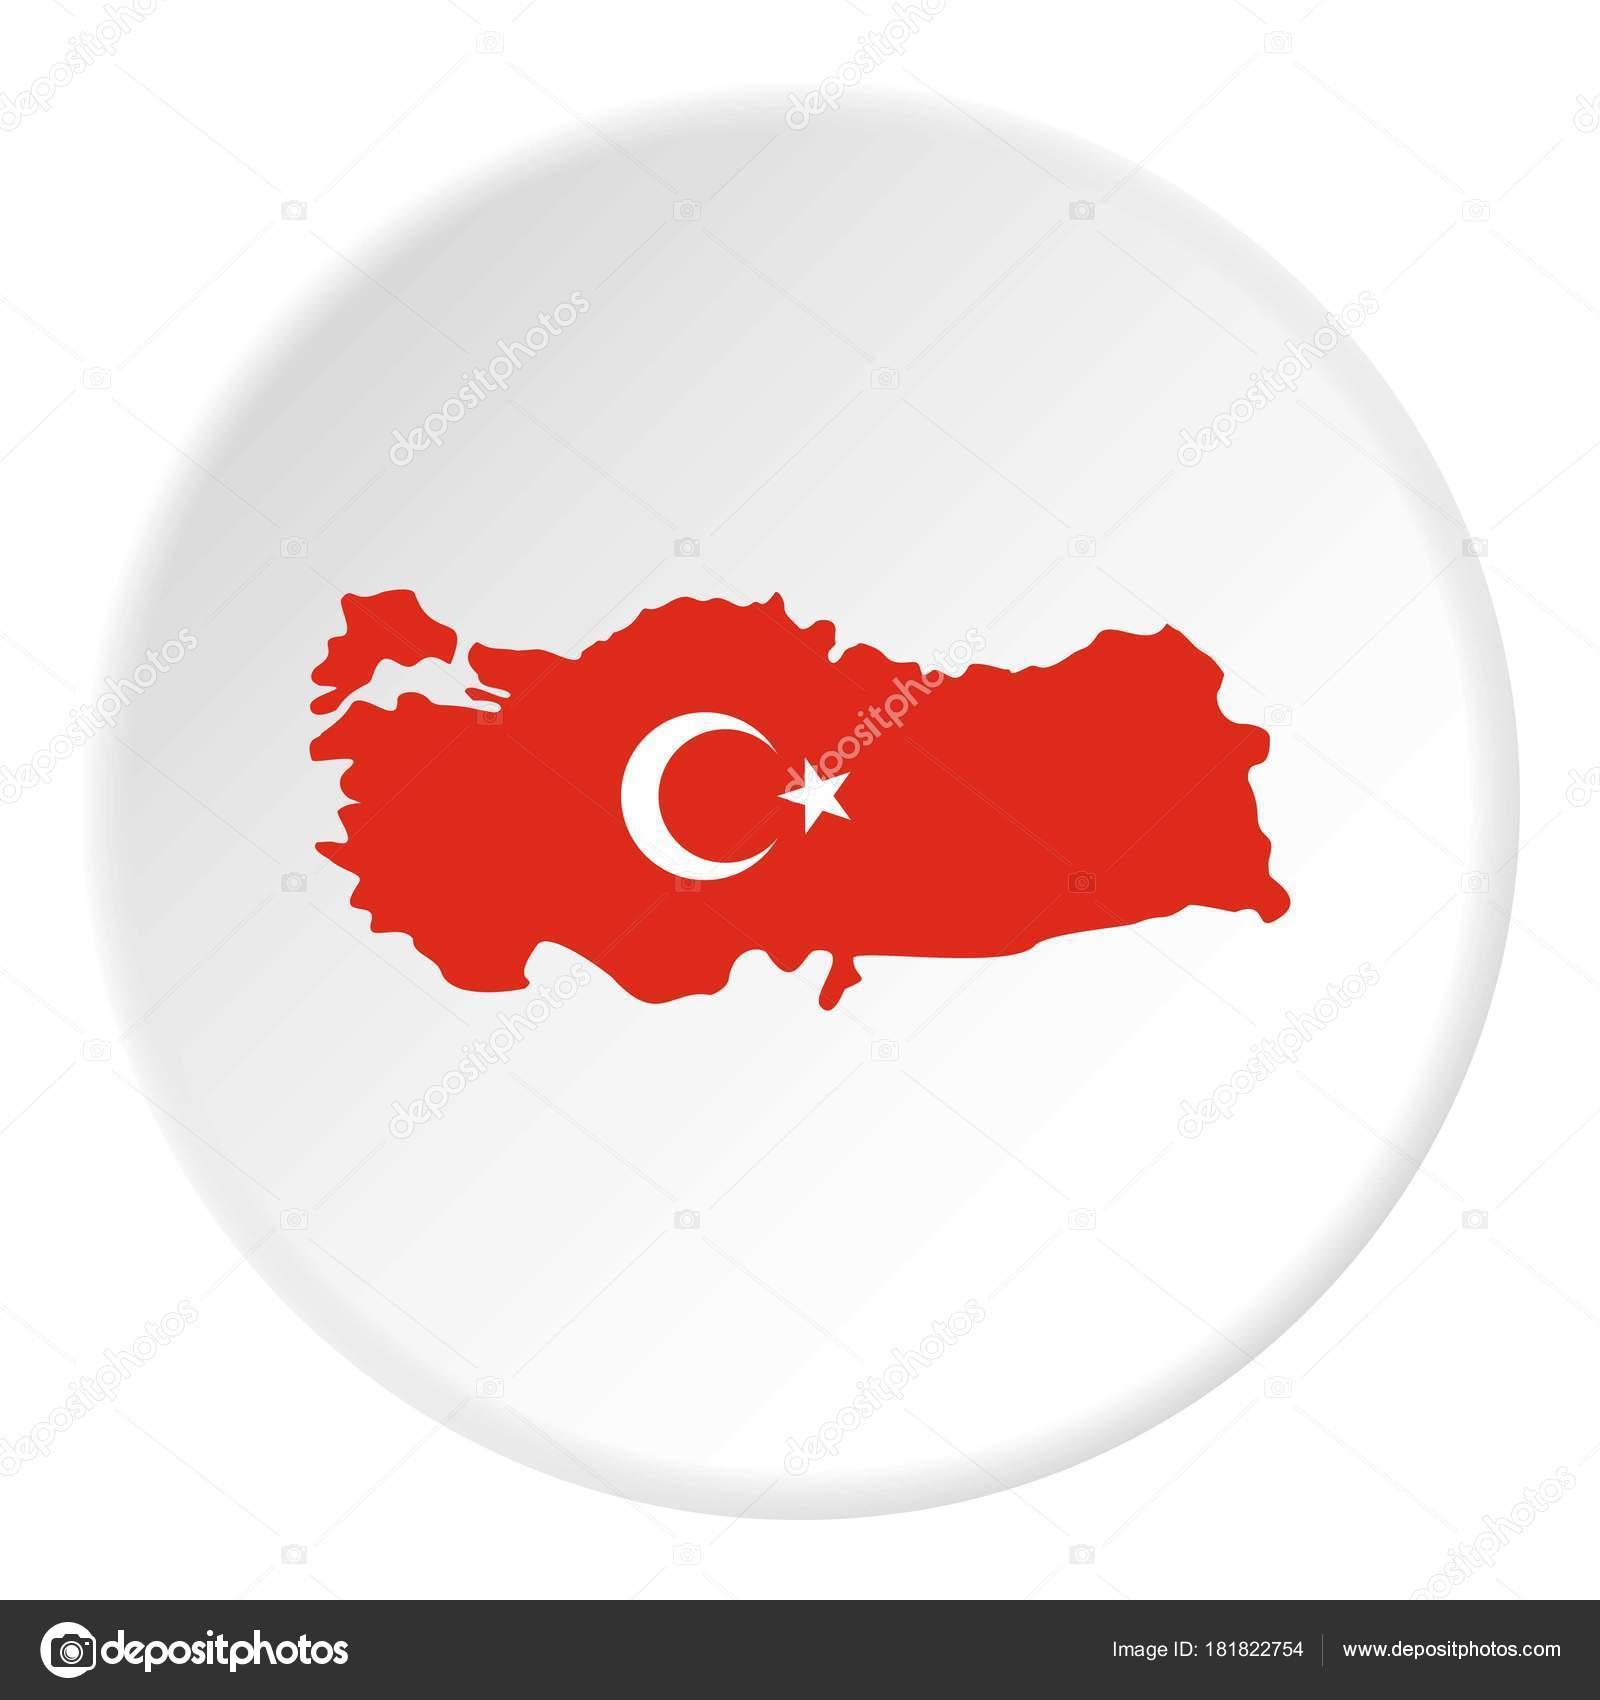 Türkei Karte in Nationalflagge Farben Symbol Kreis — Stockvektor ...